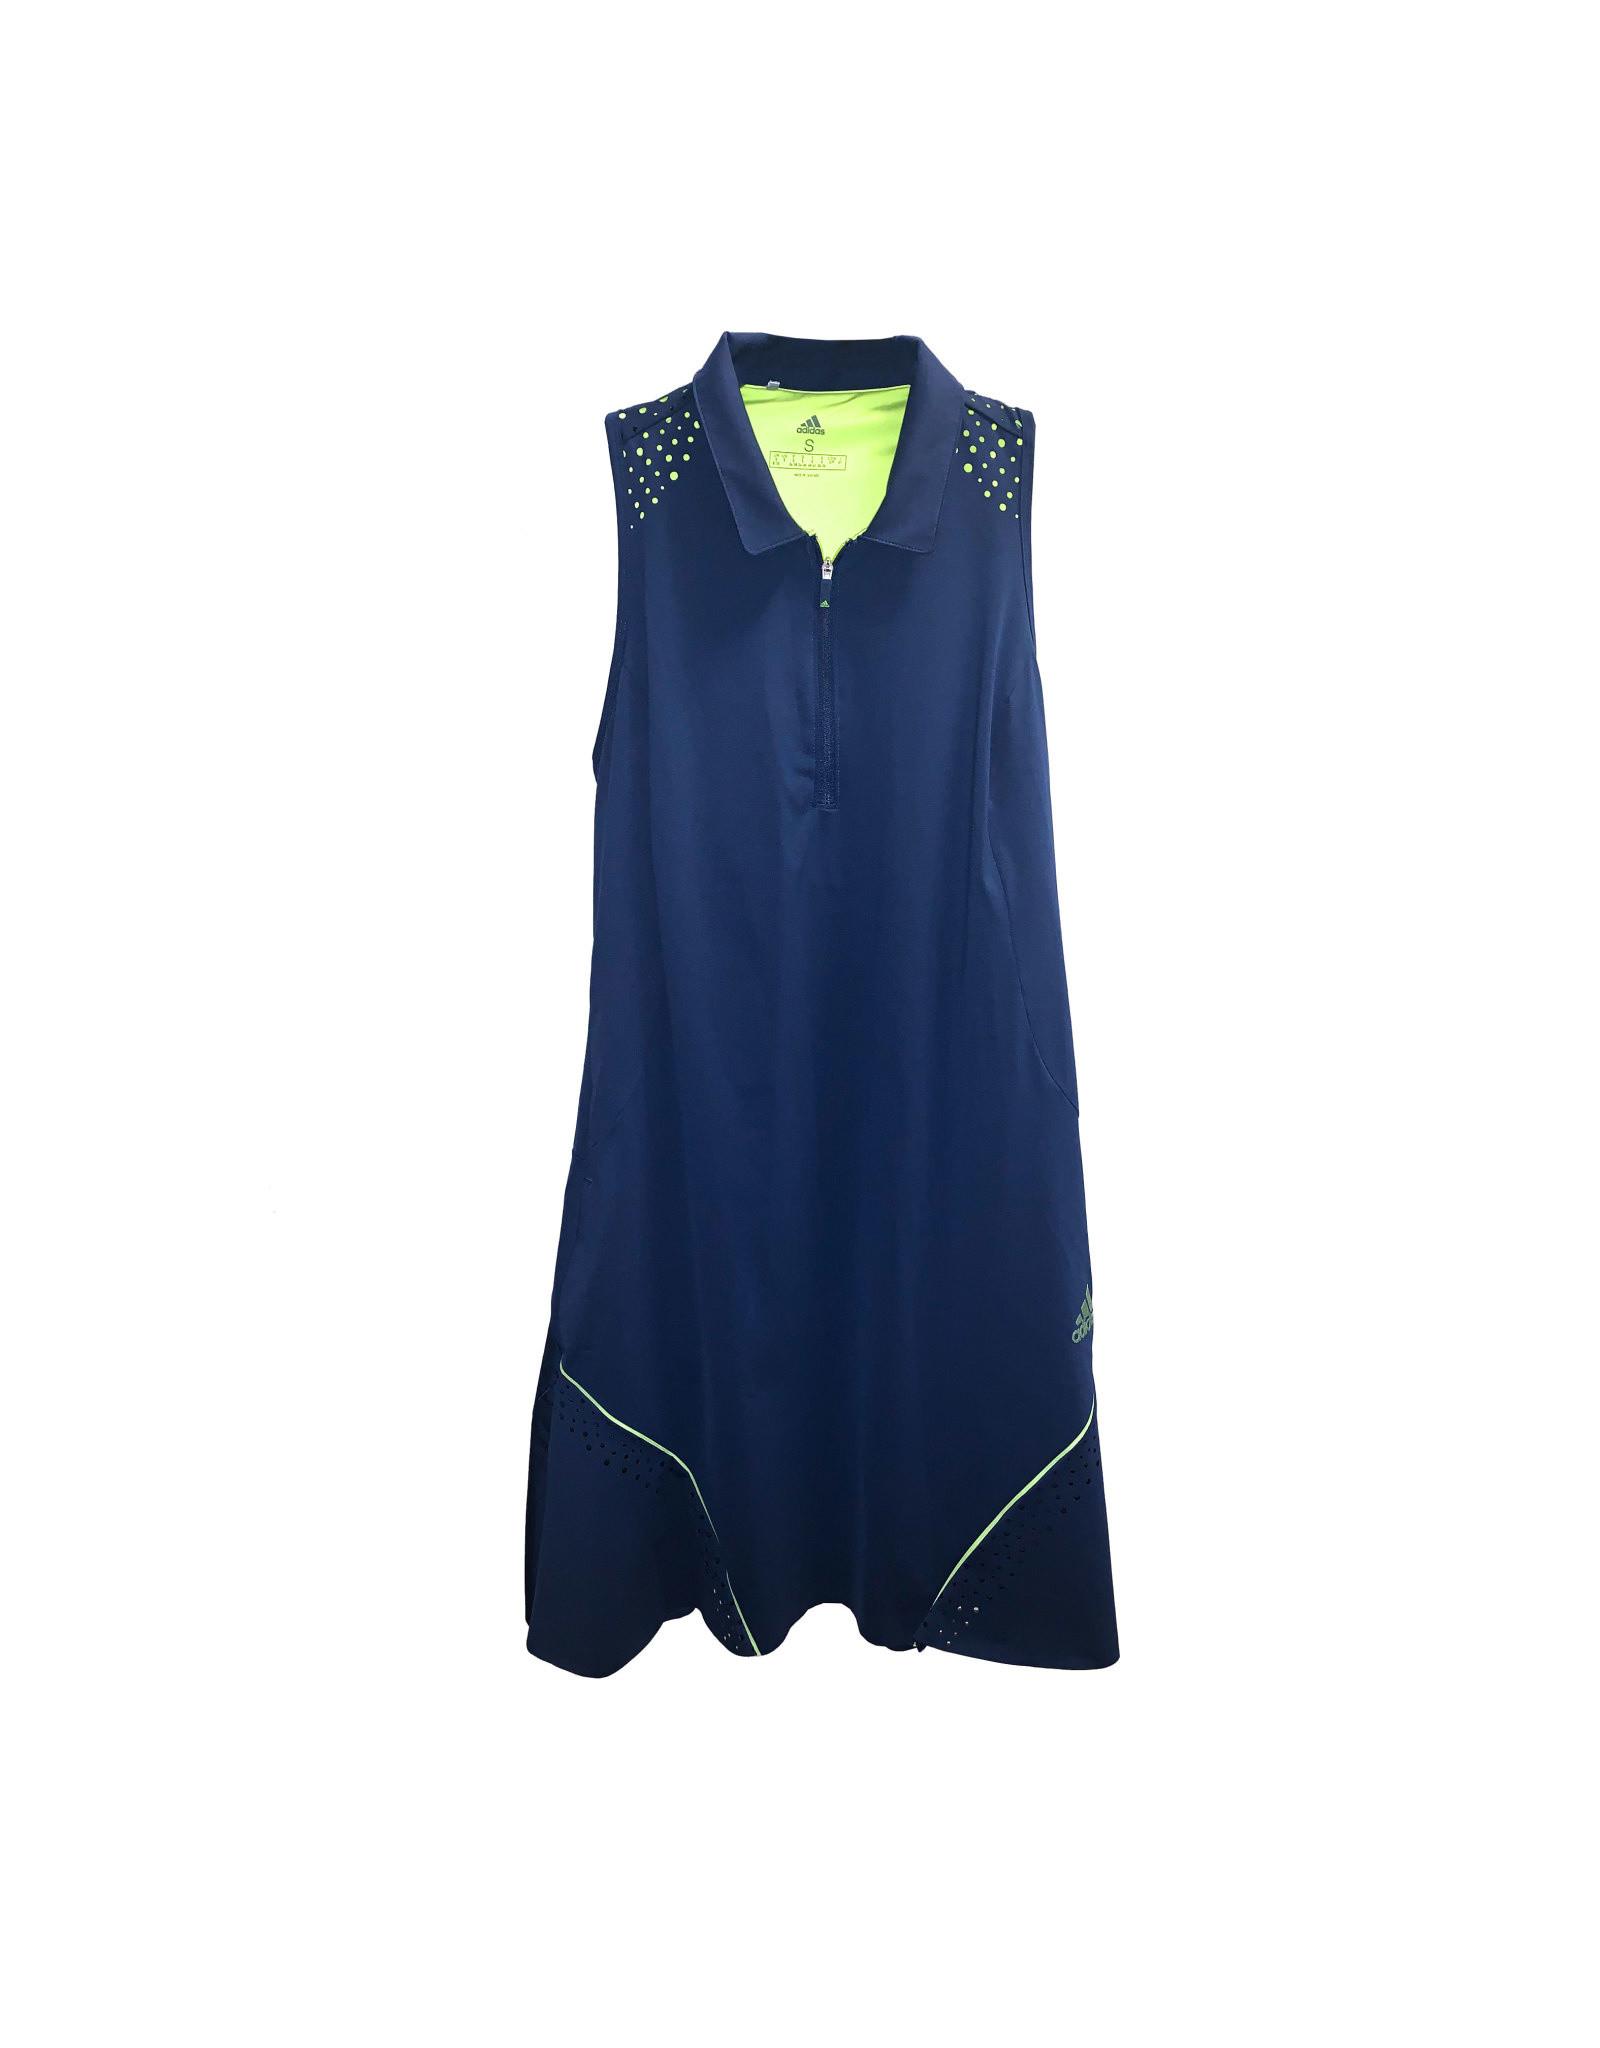 Adidas Adidas CLR Perf Dress SizeS